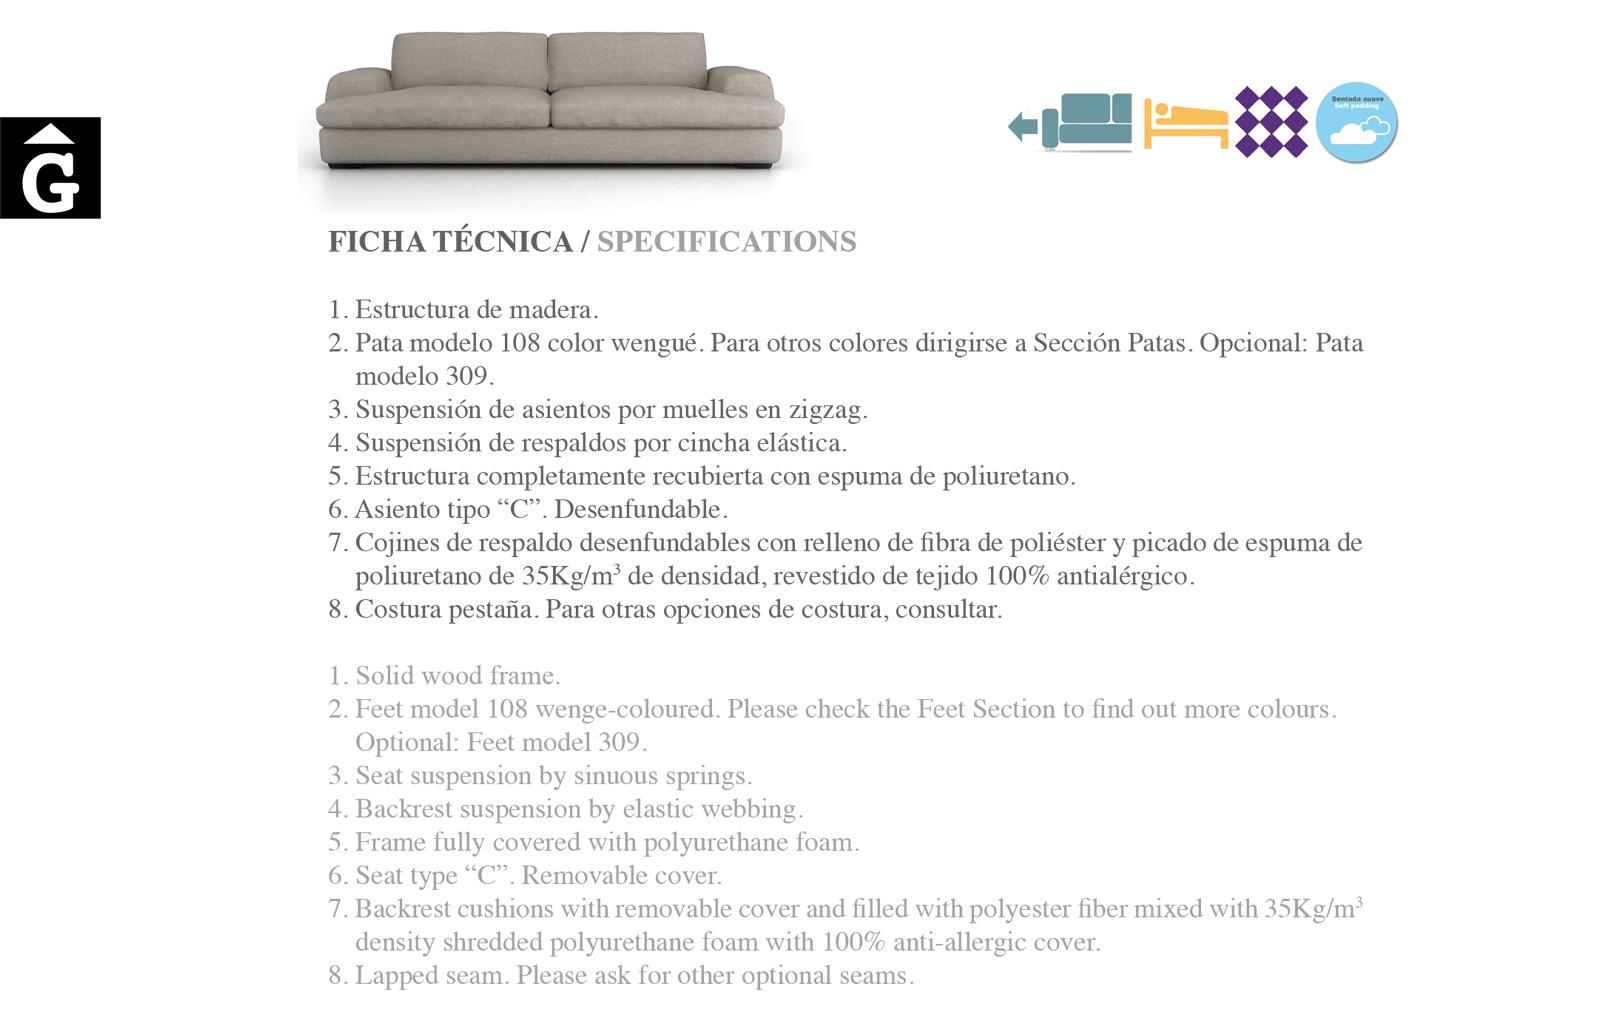 142 1 Jaja Moradillo by mobles Gifreu tapisseria de qualitat sofas relax llits puff pouf chaixelongues butaques sillons